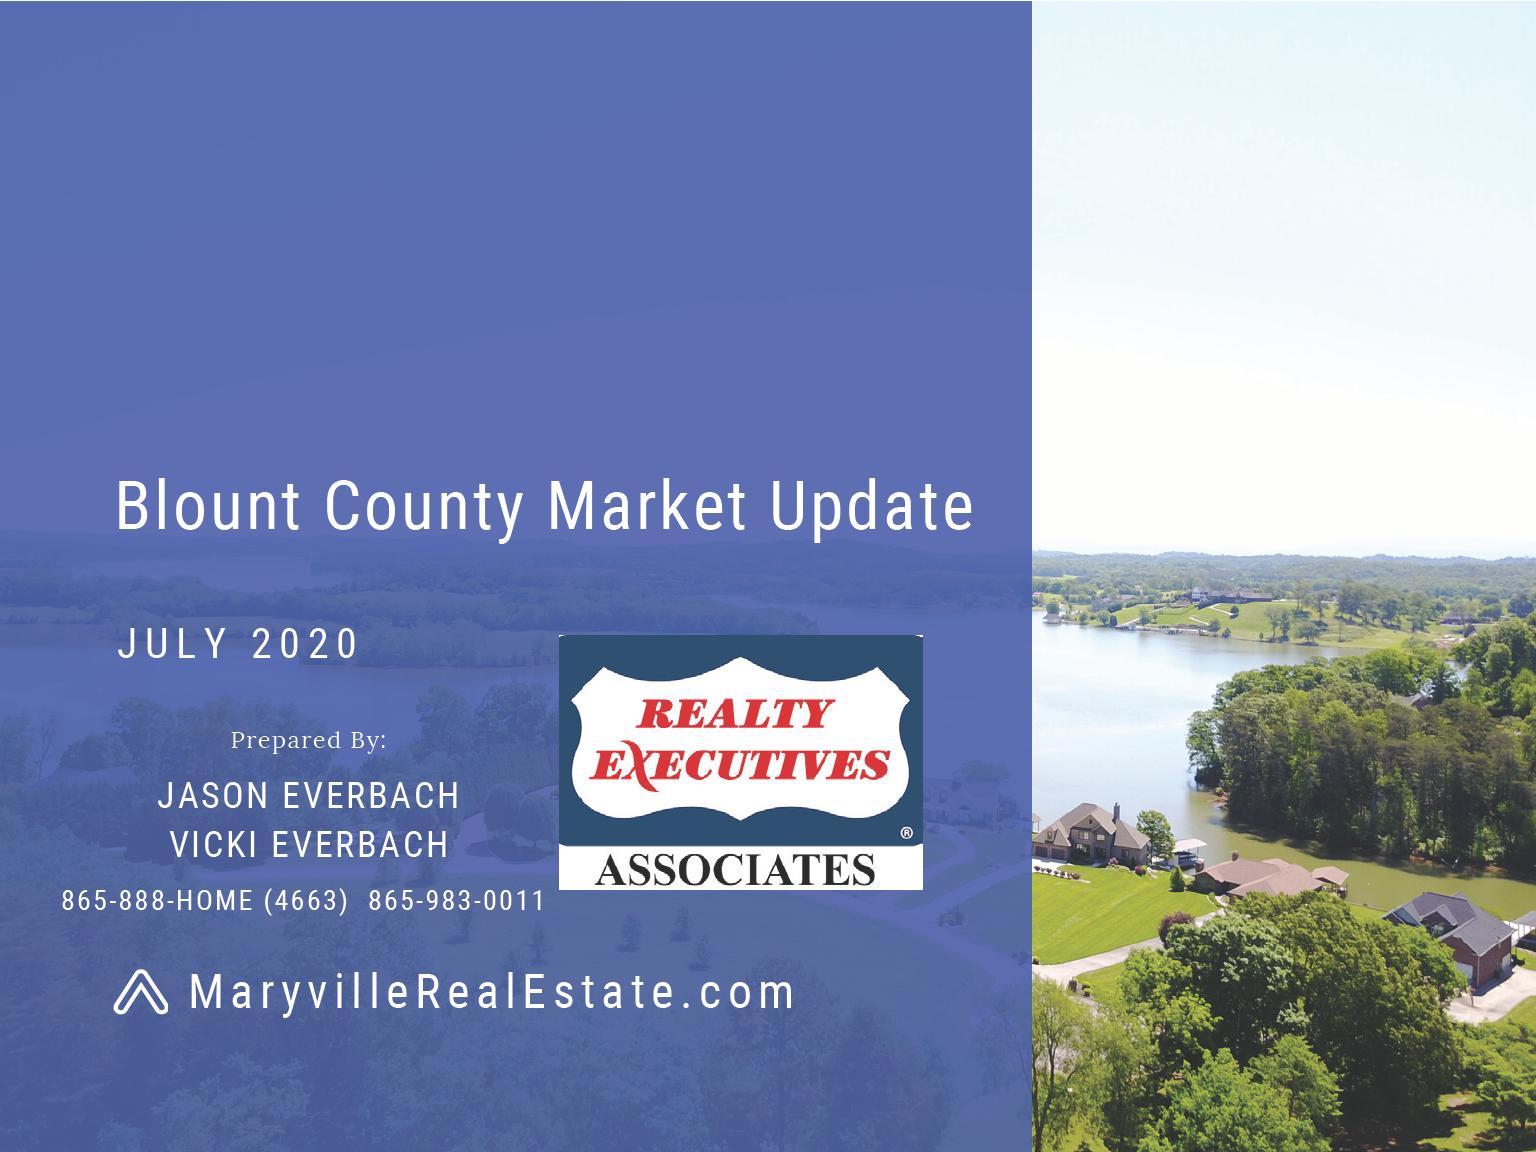 July 2020 Blount County Market Update